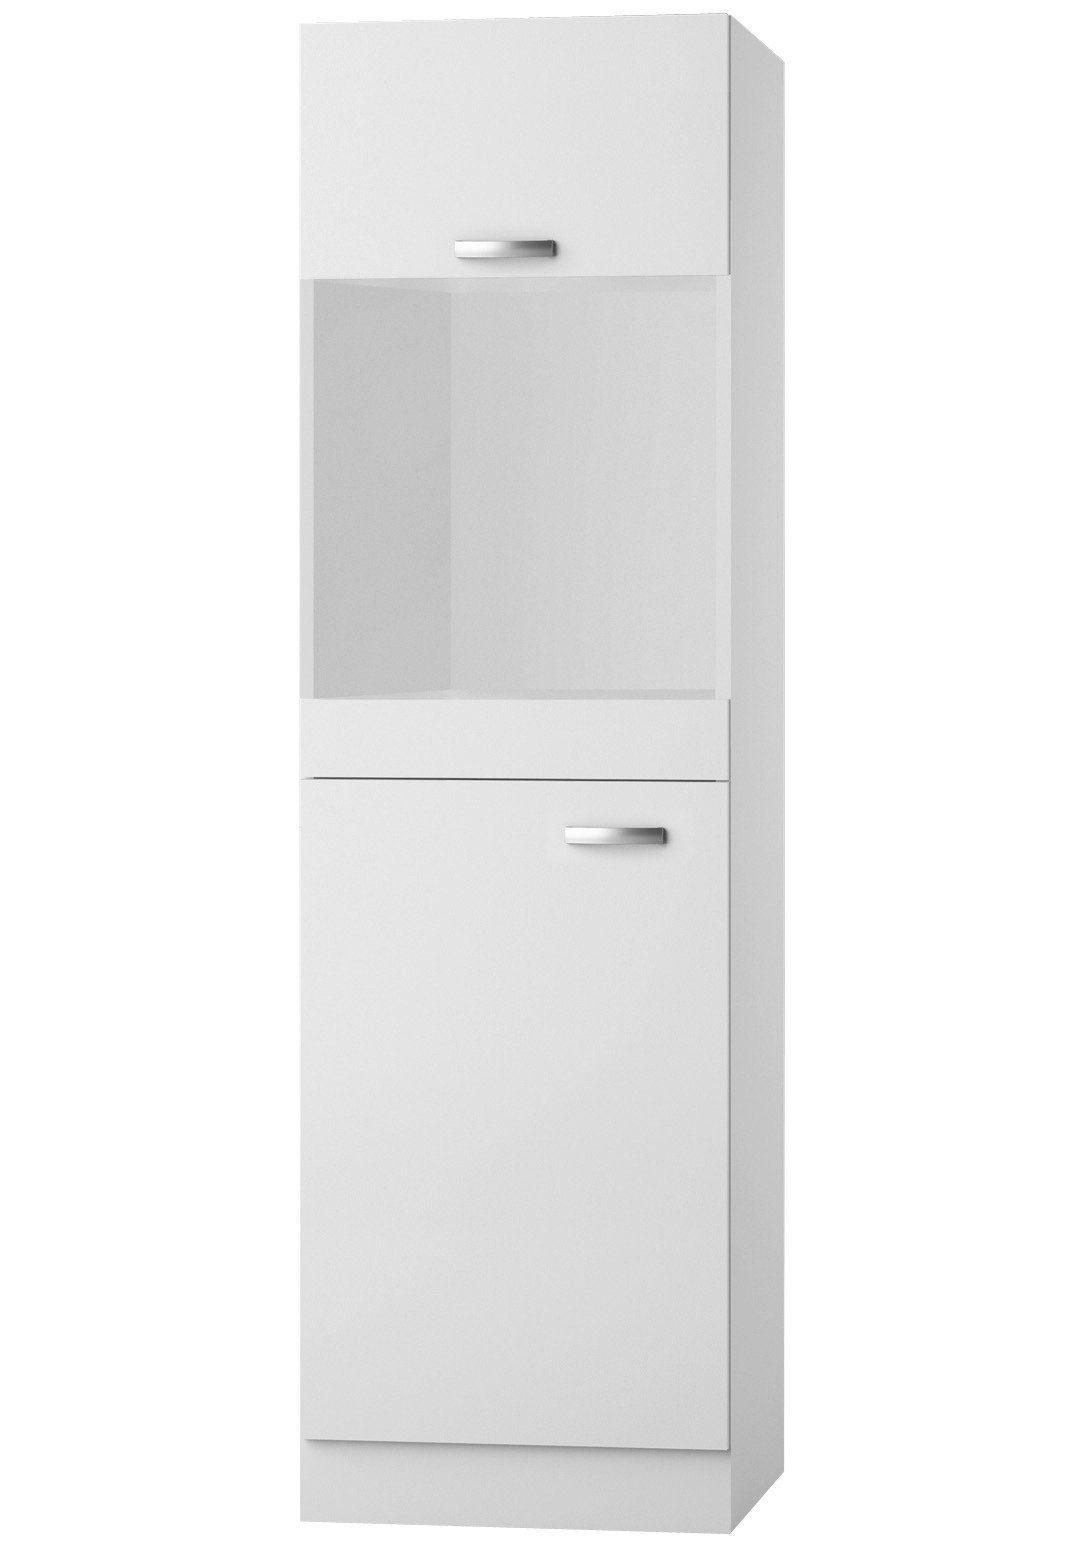 Kombinierter Backofen-Kühlumbauschrank »Lagos«, Höhe 206,8 cm